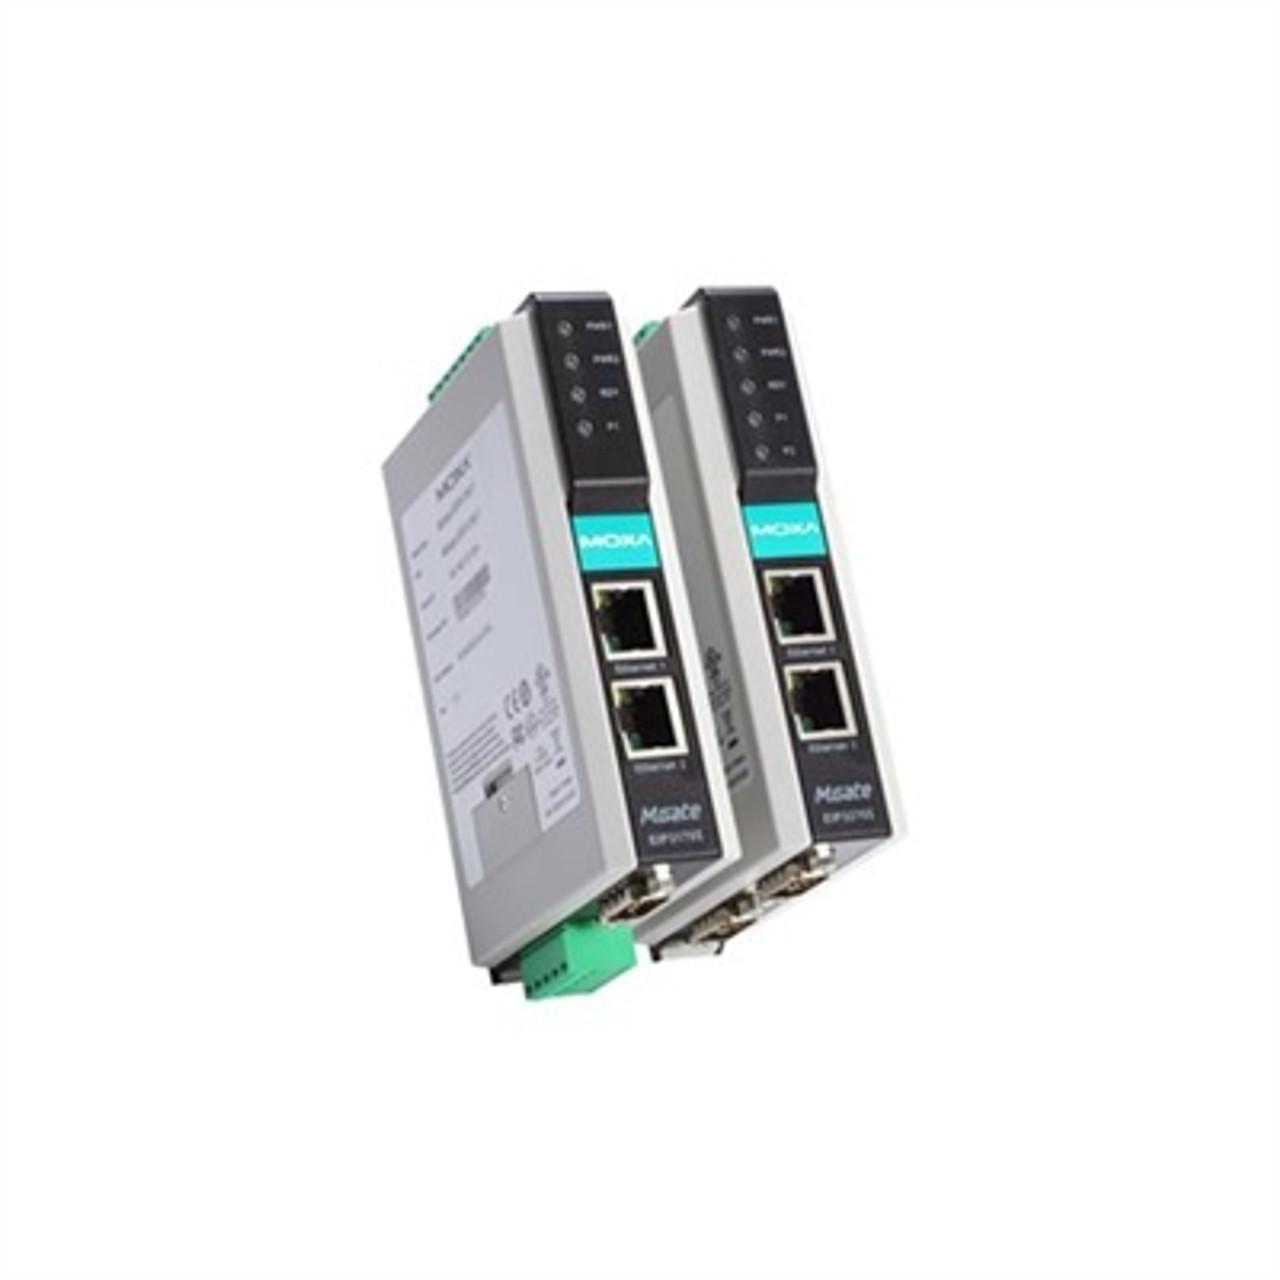 Moxa MGate EIP3170 1-Port Df1 To Ethernet/IP Gateway